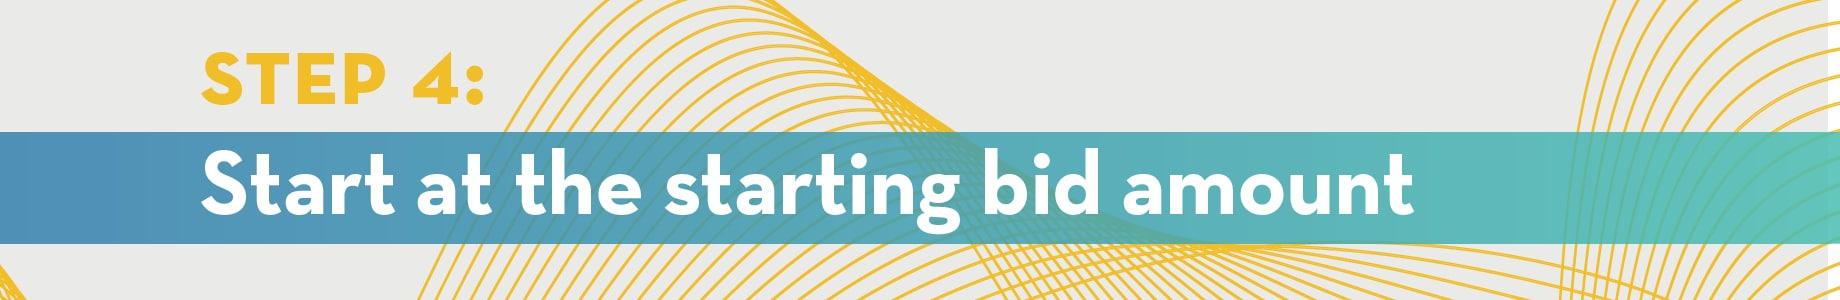 Step 4: Start at the starting bid amount